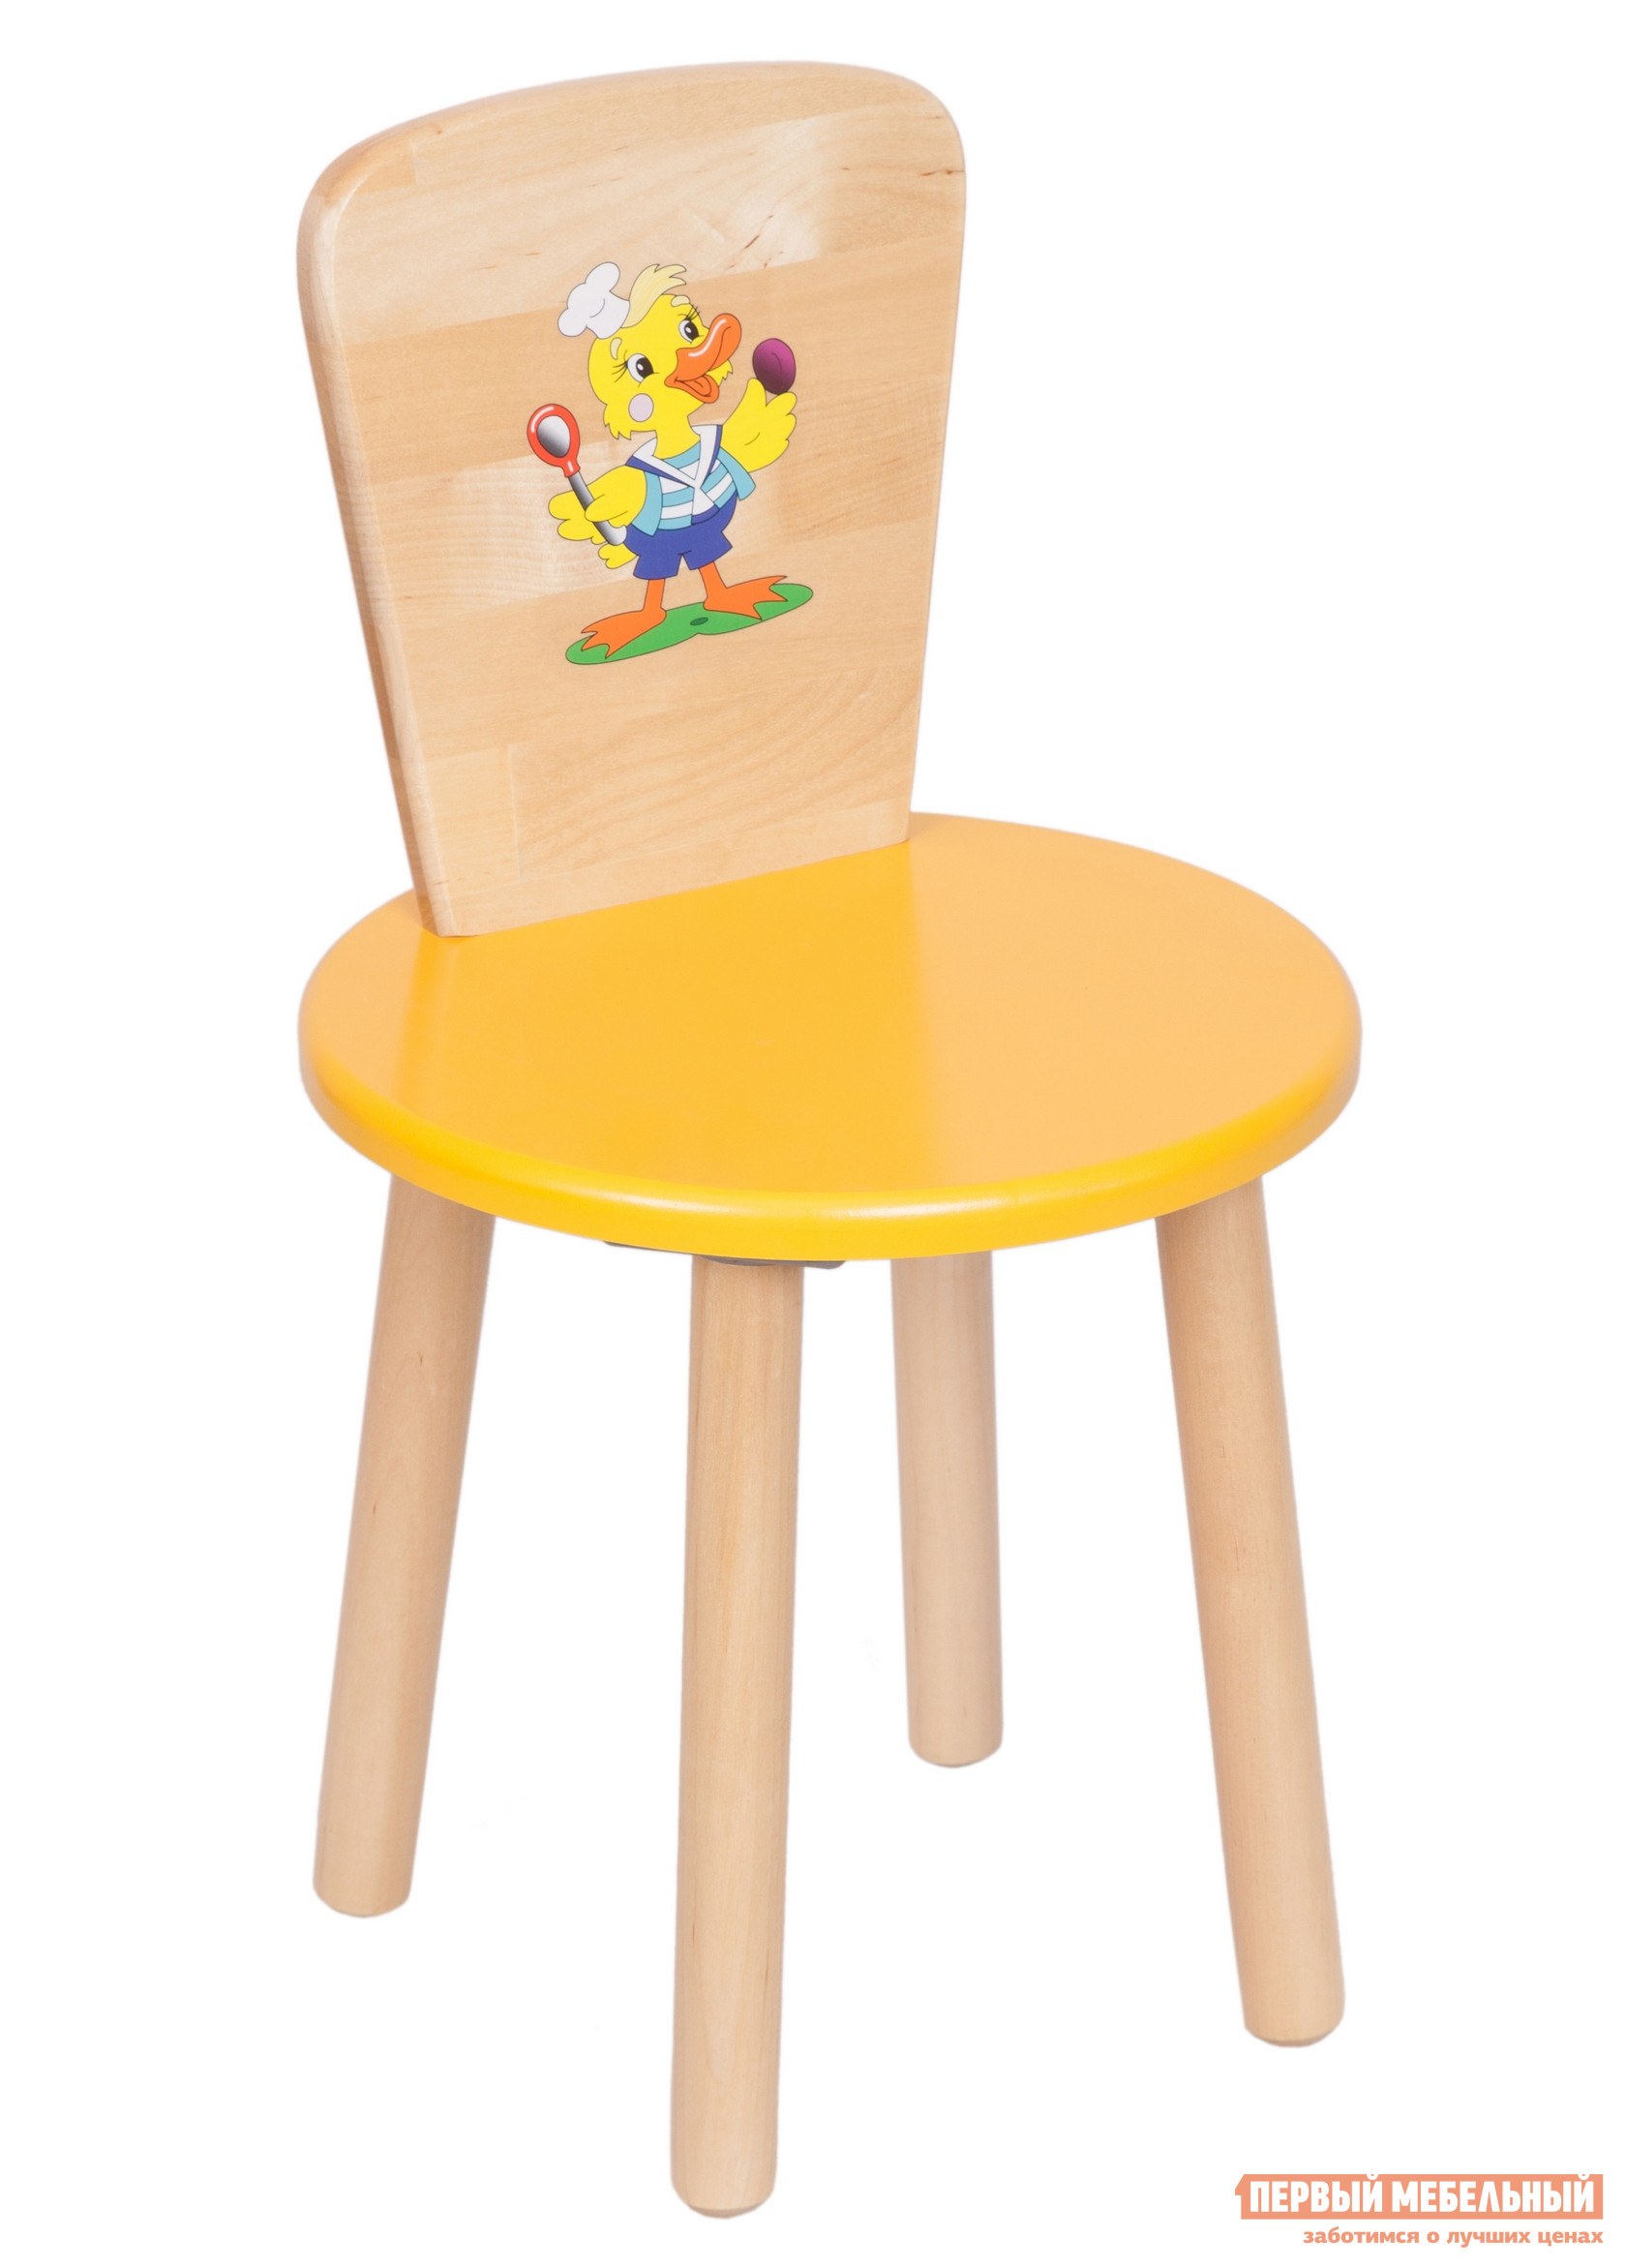 Столик и стульчик РусЭкоМебель Стул Круглый ЭКО Эко желтый, рис. Утенок